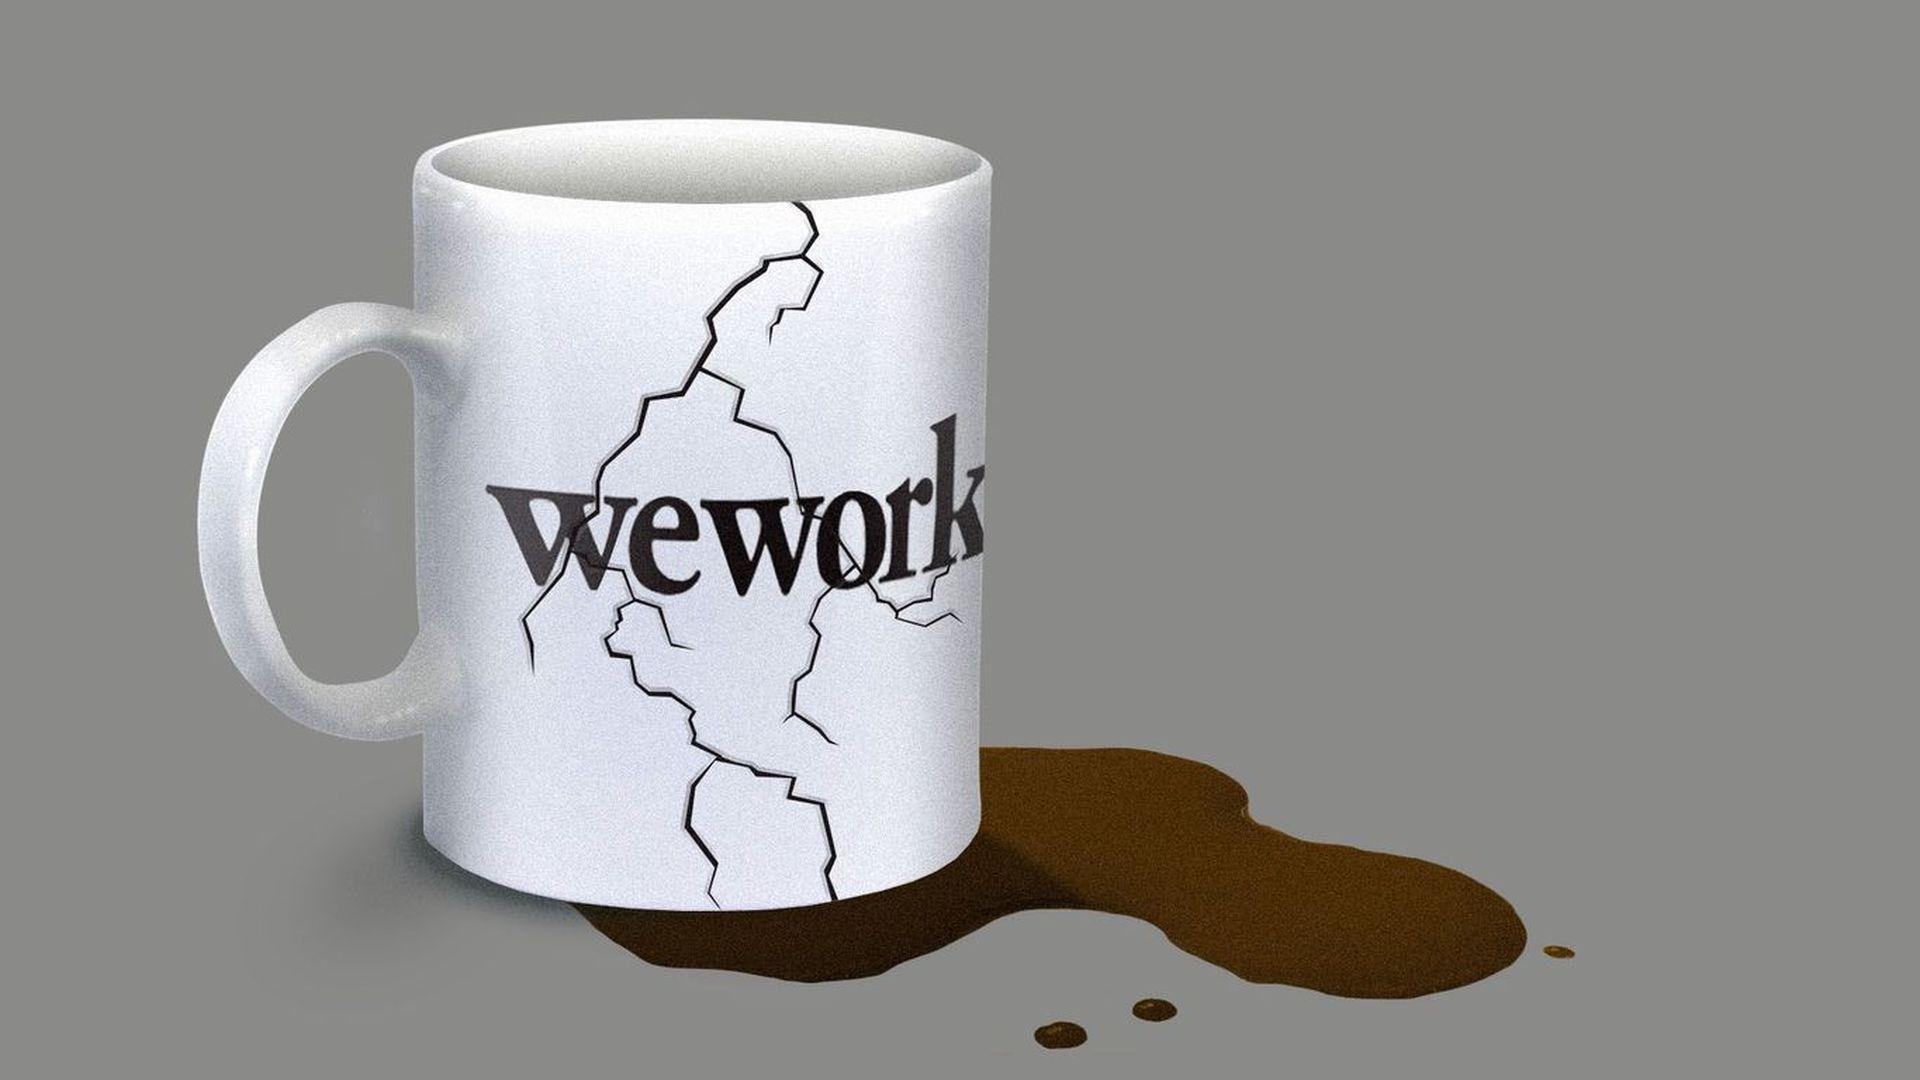 WeWork reports $1.25 billion net loss for Q3